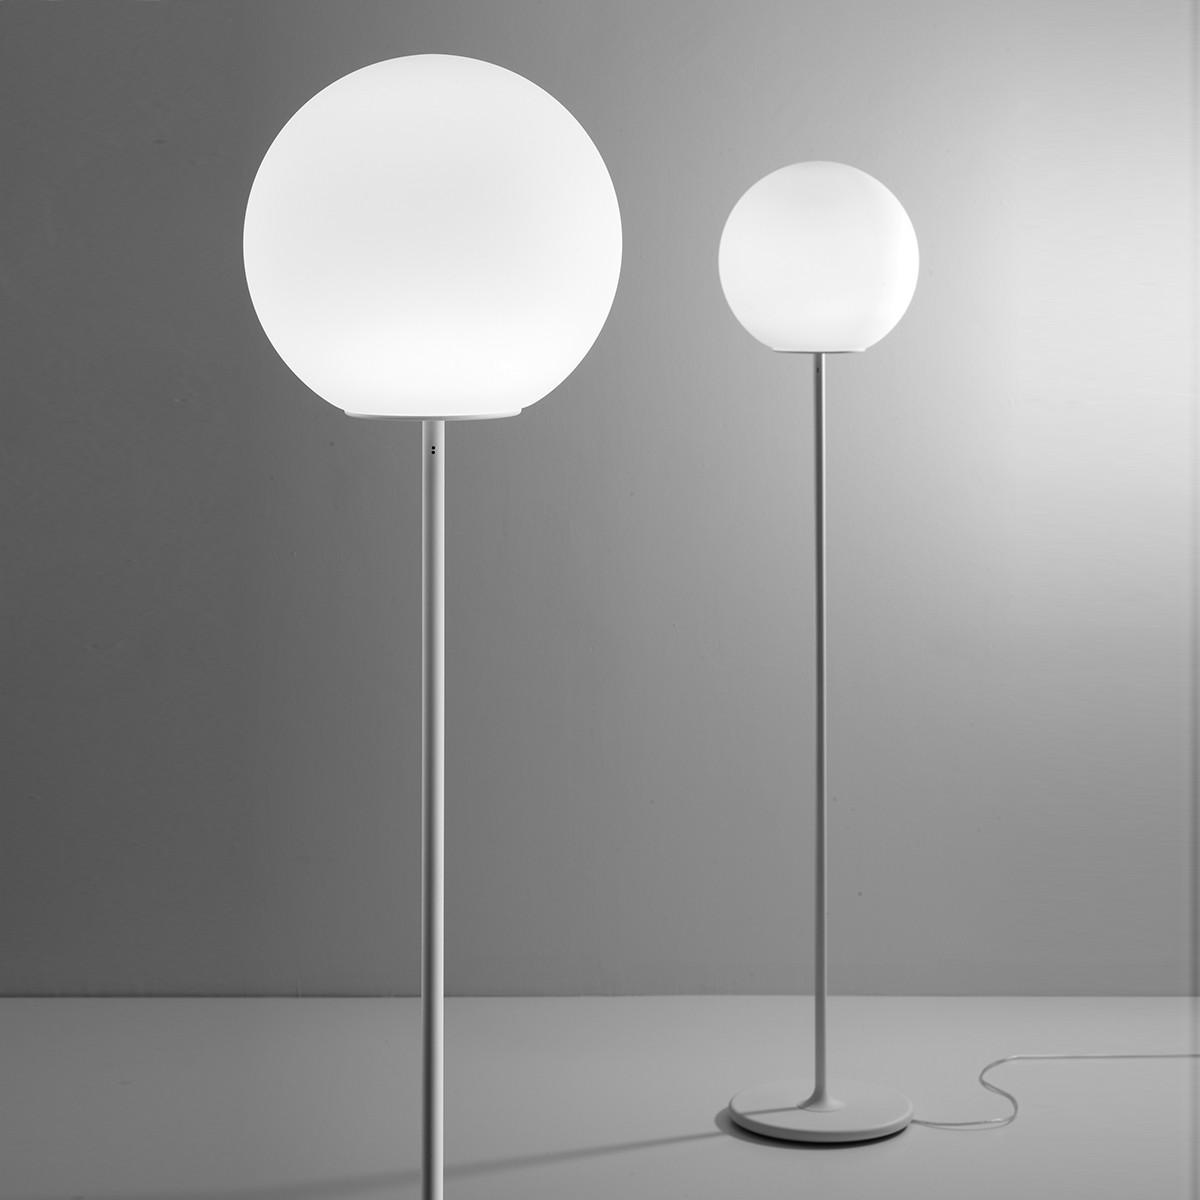 Fabbian Lumi Sfera Stehleuchte, weiß, Ø: 40 cm